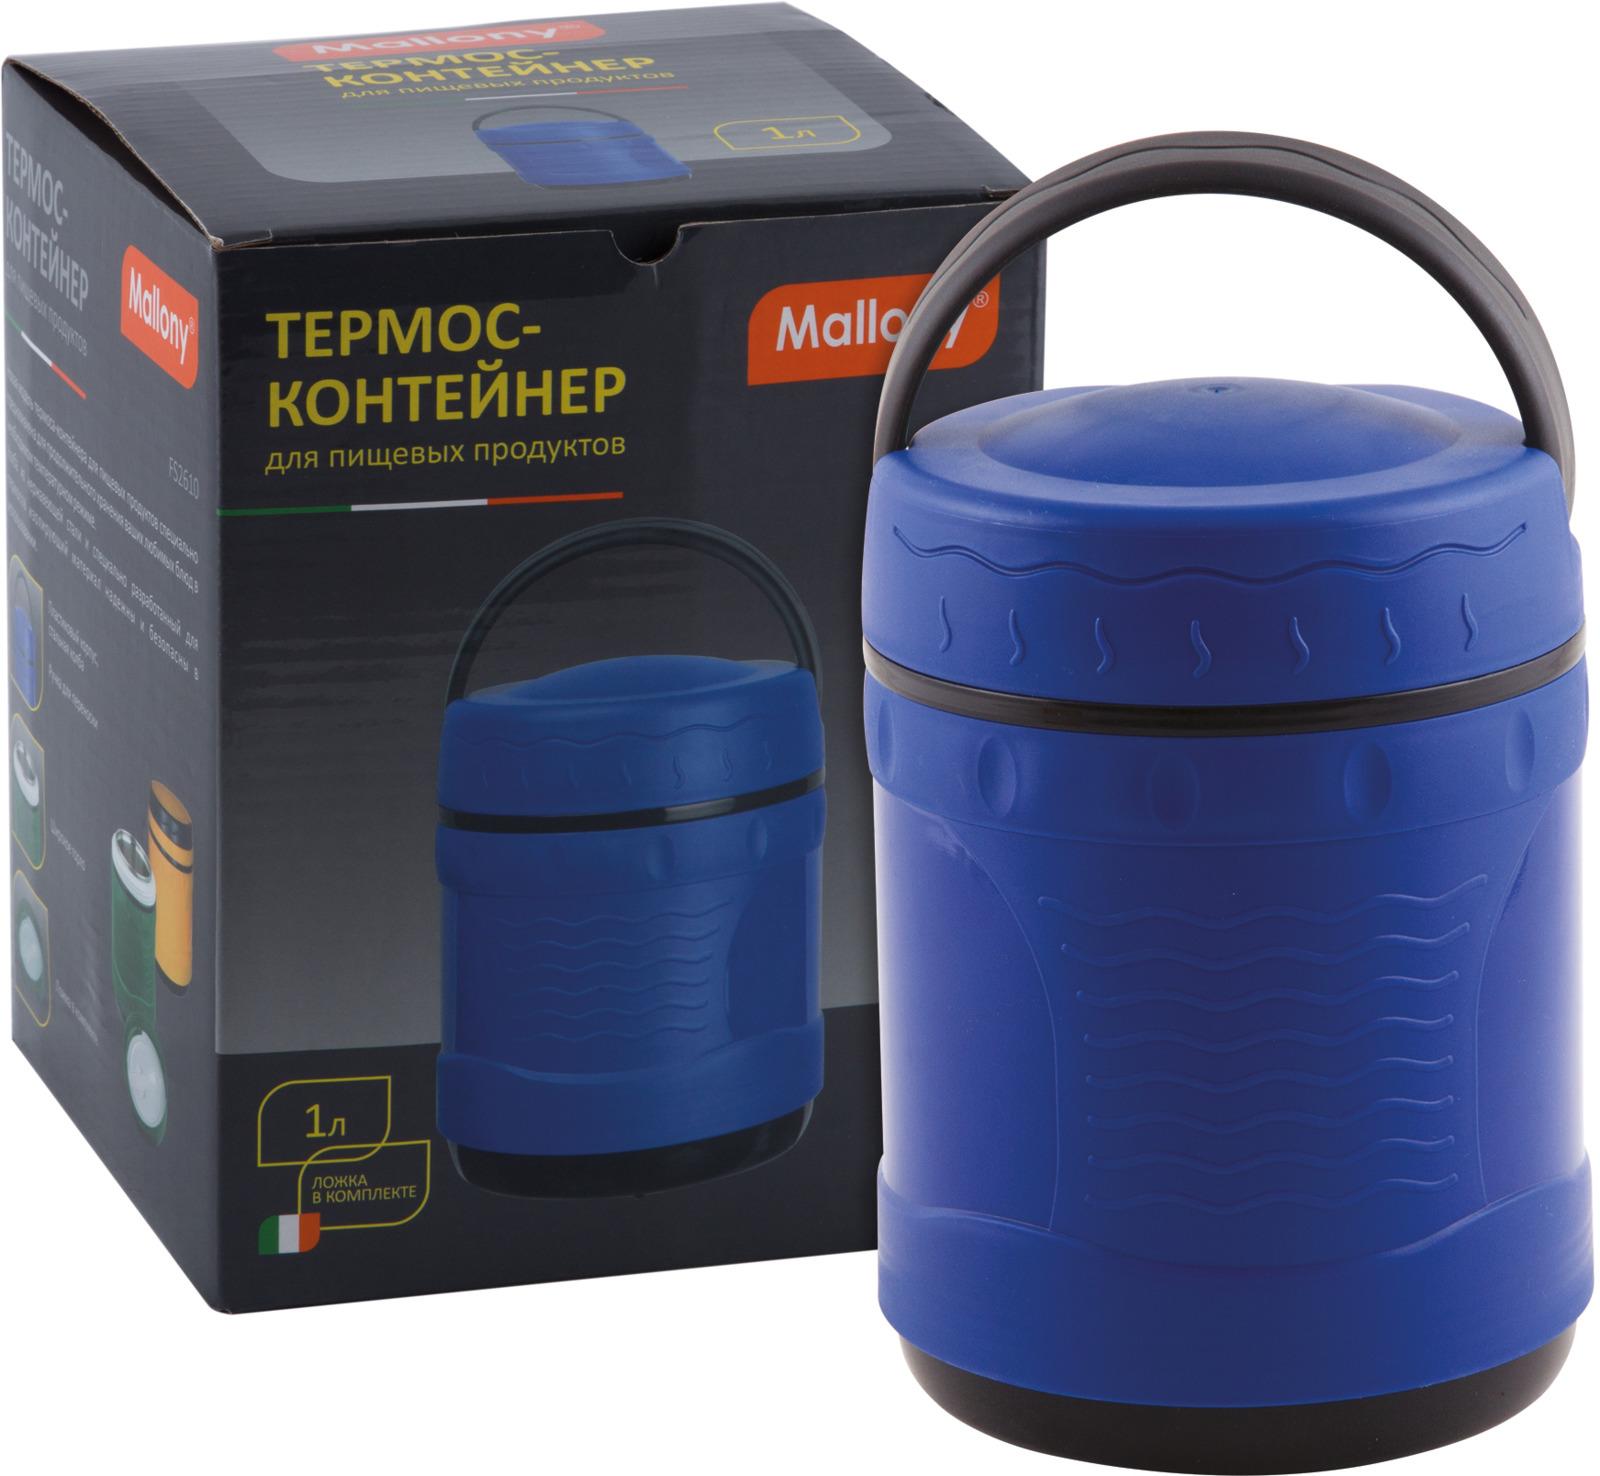 Термос Mallony, цвет: синий, цвет: в ассортименте, 1 л mallony термос t85100 1 0 л широкое горло mallony